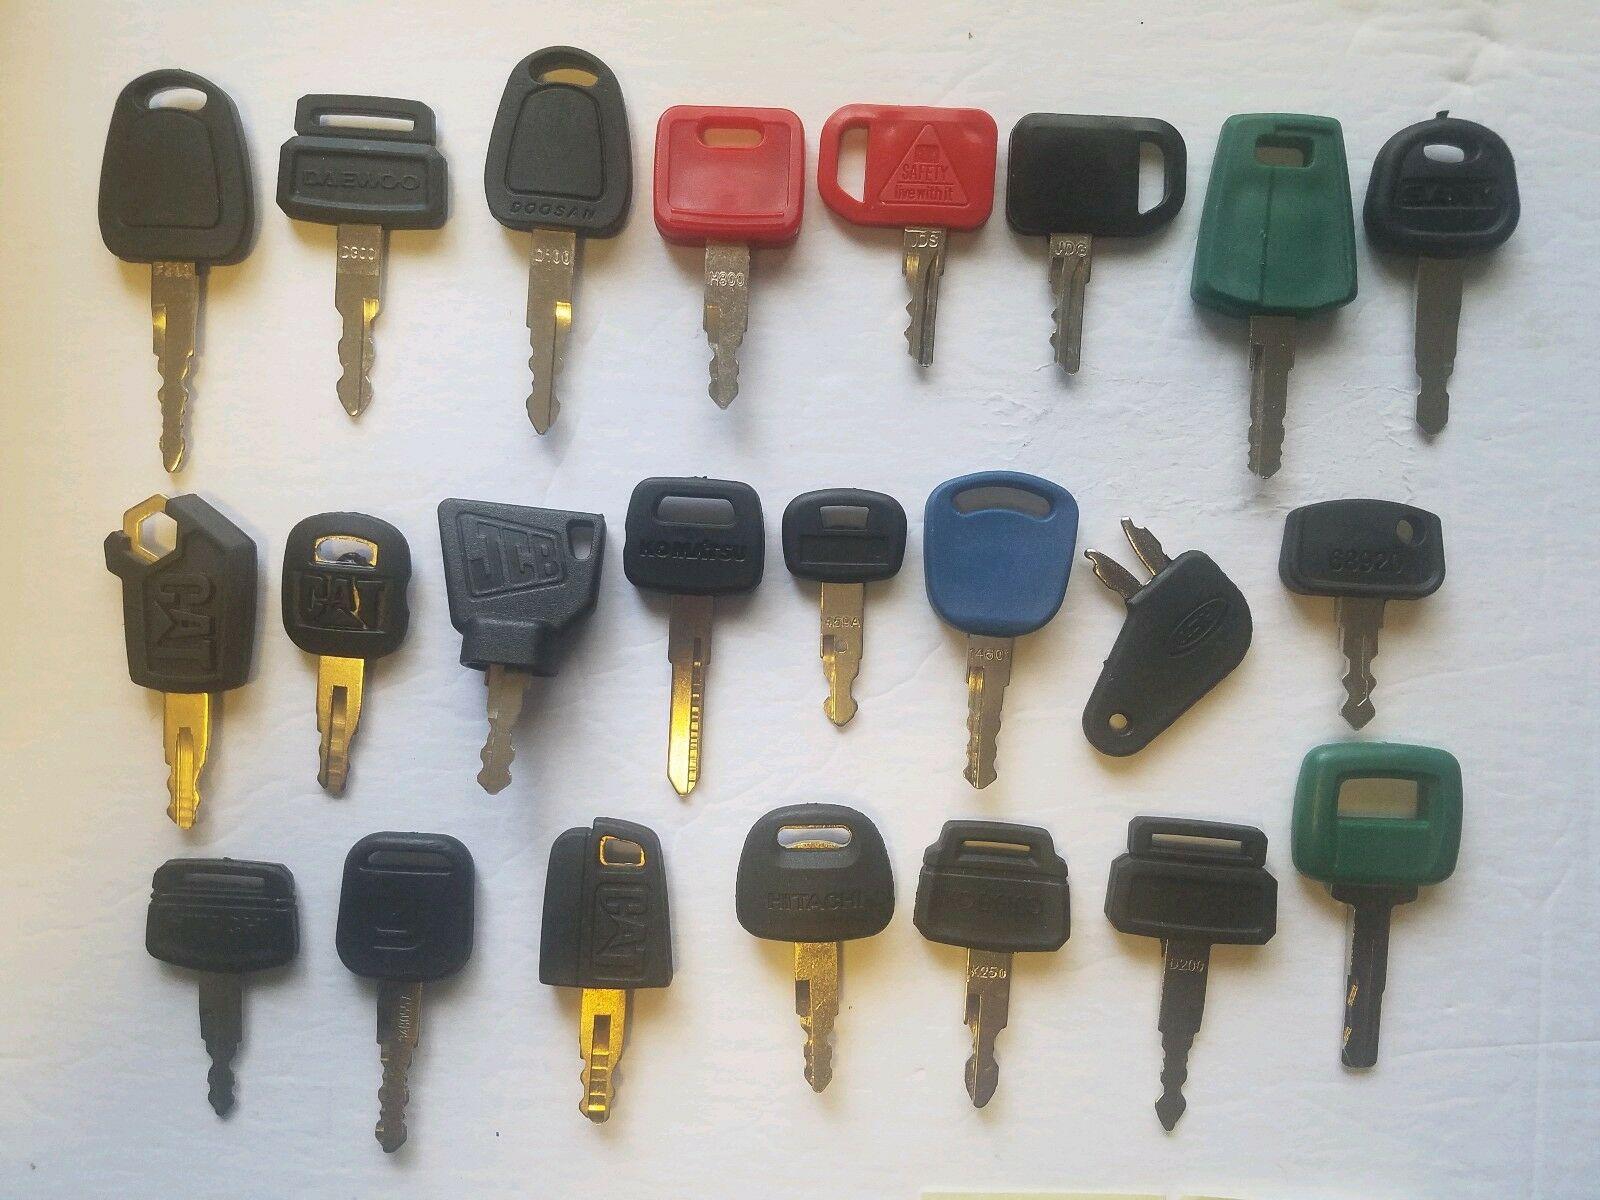 23 Heavy Equipment Construction Ignition Keys Key Set Heavy Equipment Keys